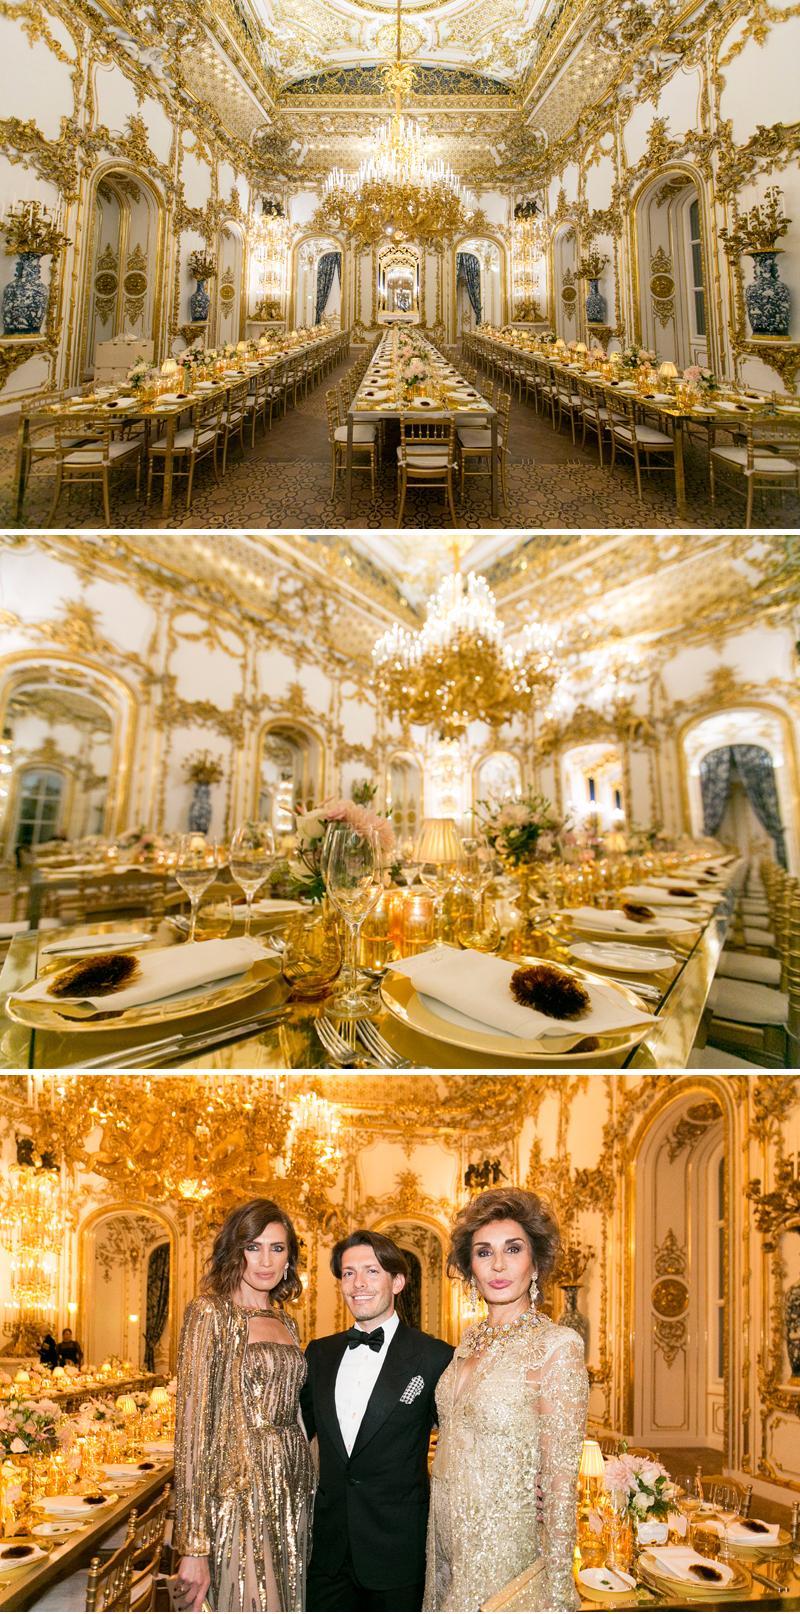 Aquazzura, Aquazzura X Mytheresa.com, Vienna, Woman in Gold, Liechtenstein Palace, Gold Wedding Decor Inspiration, Perfect Wedding Magazine, Perfect Wedding Blog